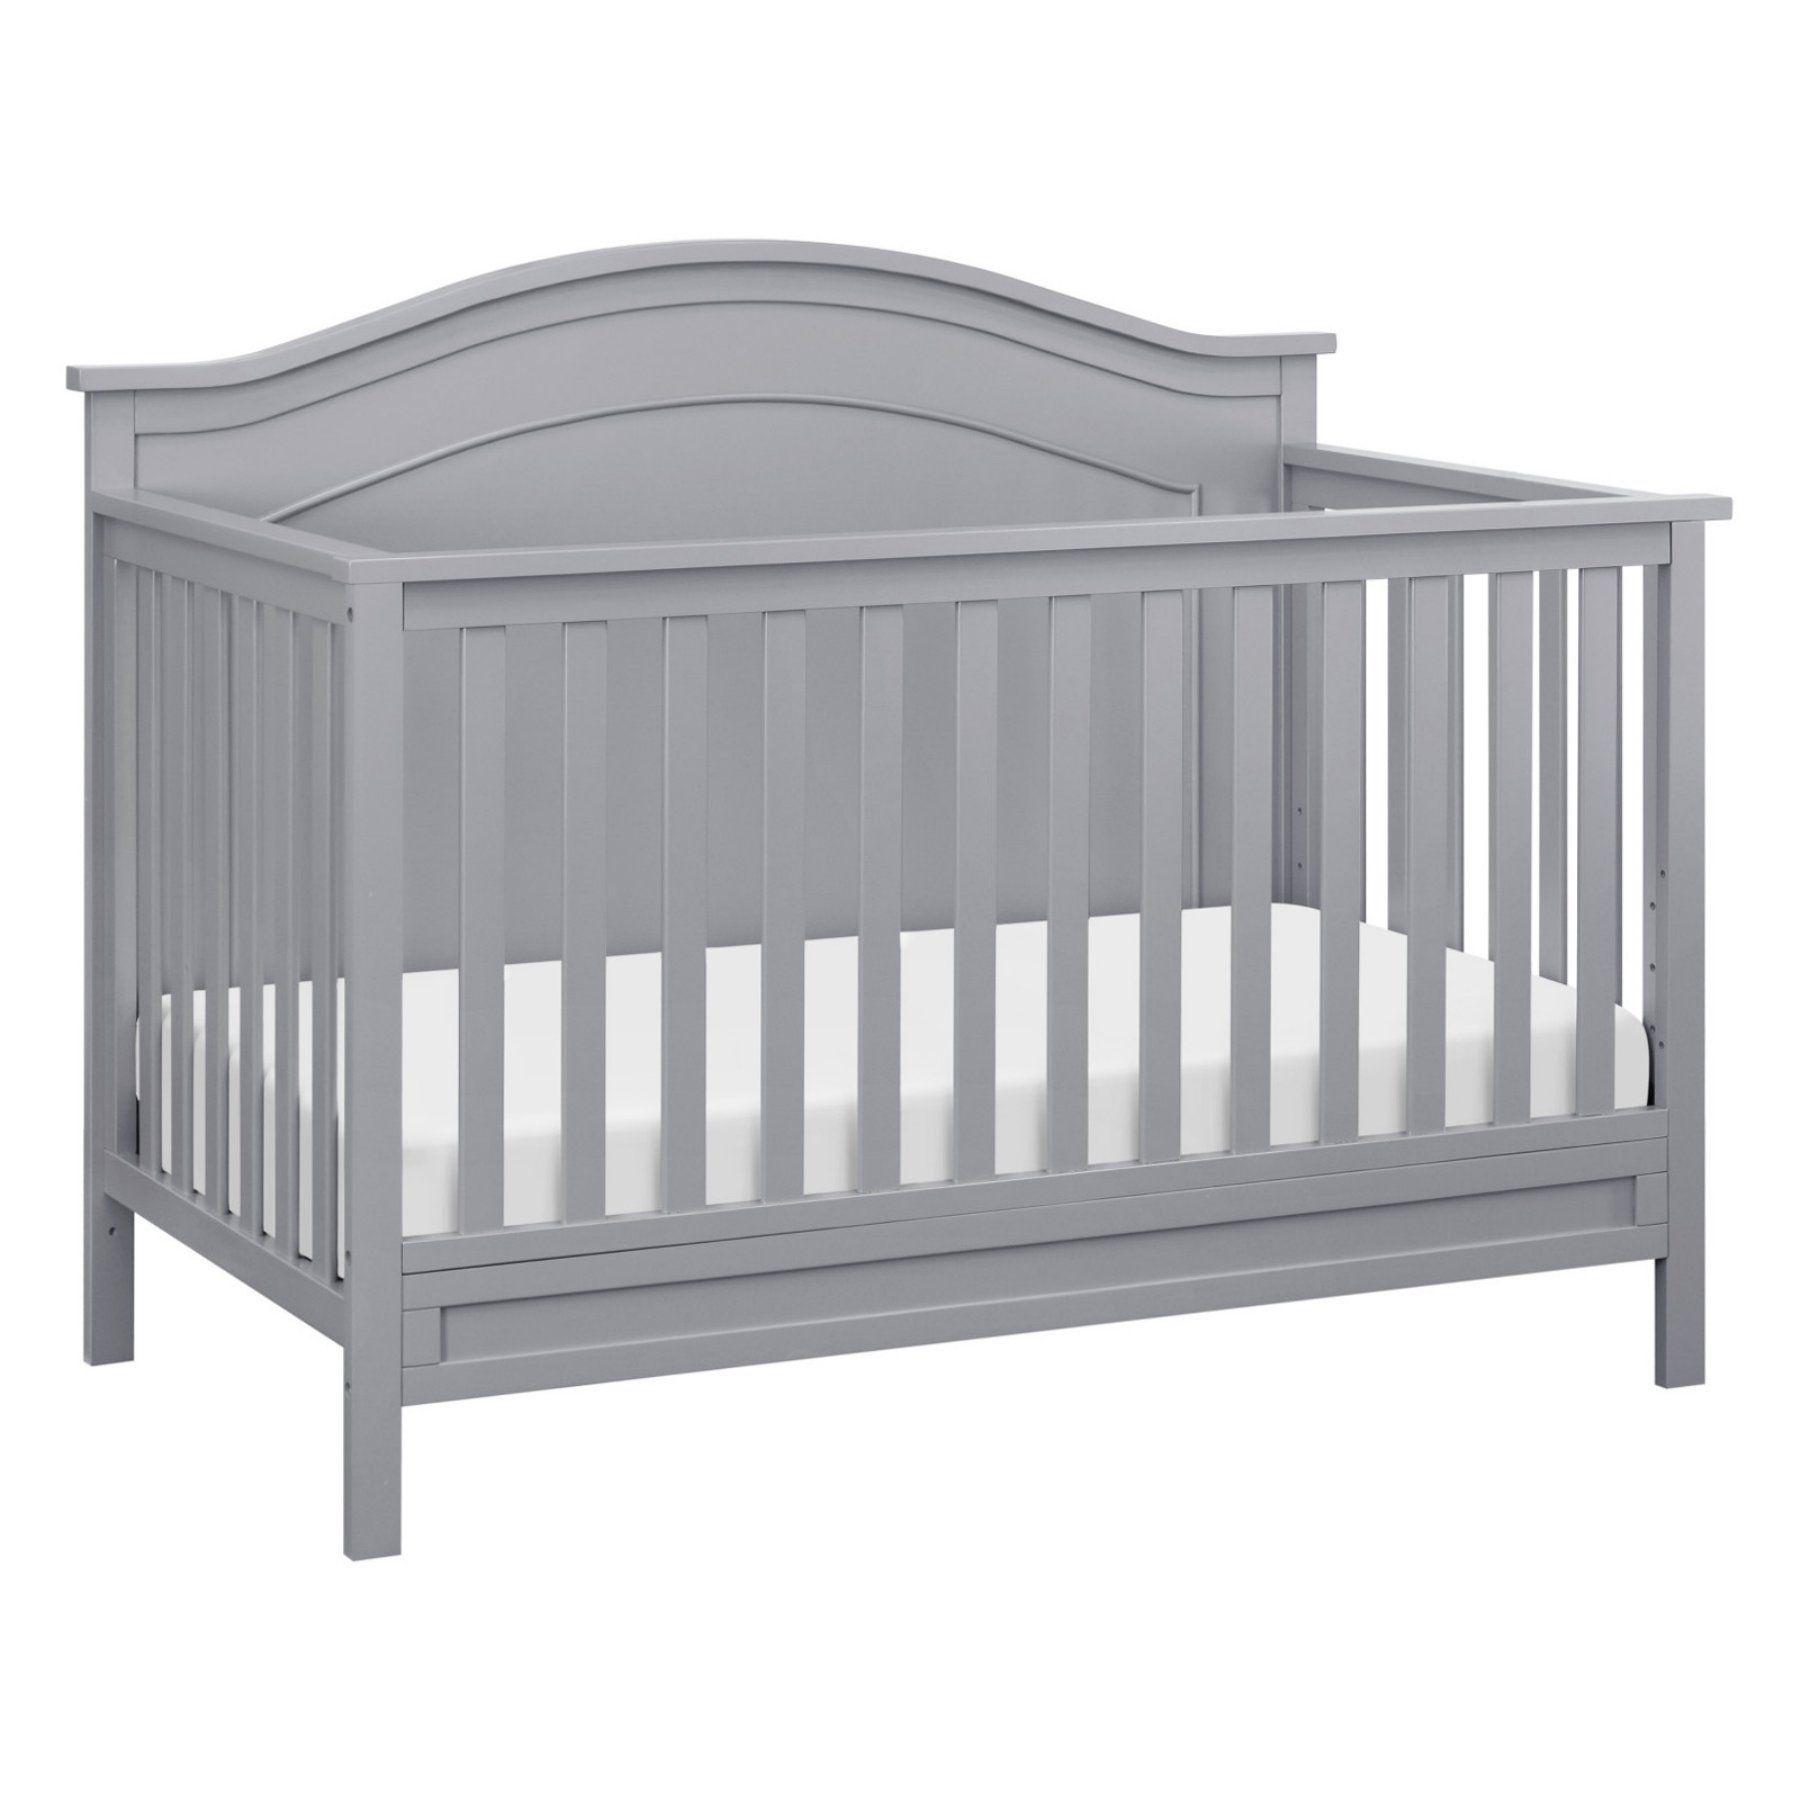 Davinci Classic Charlie 4 In 1 Convertible Crib Convertible Crib Convertible Crib Grey Cribs